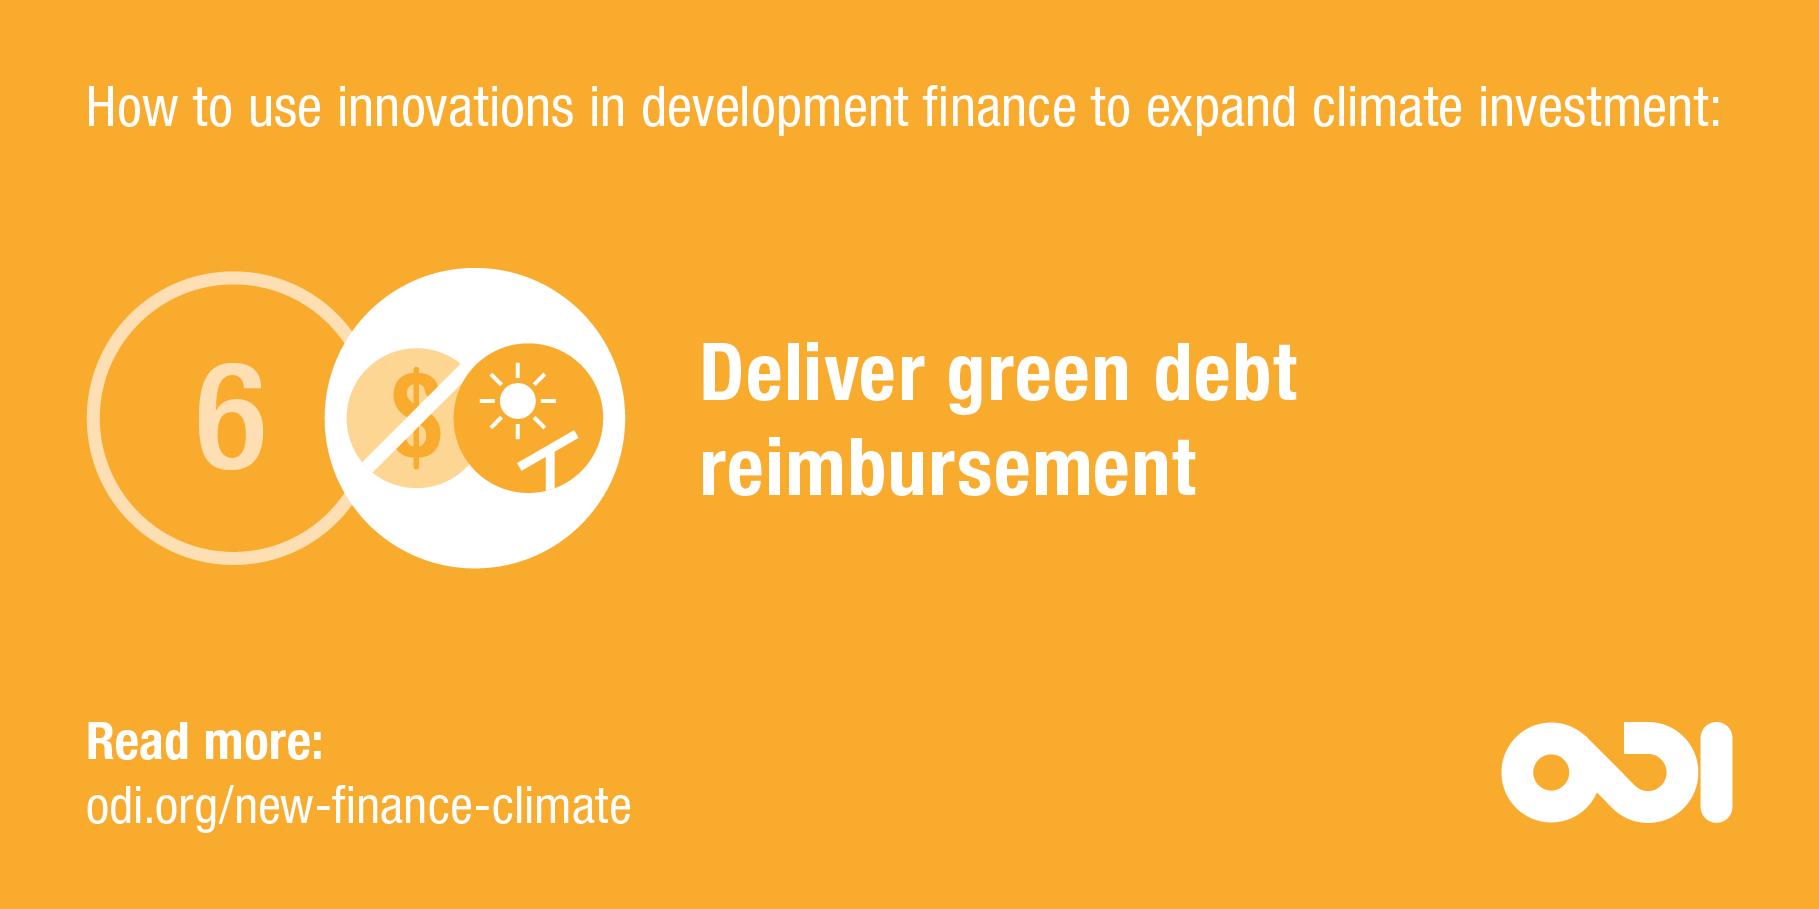 Development finance proposal 6: deliver green debt reimbursement